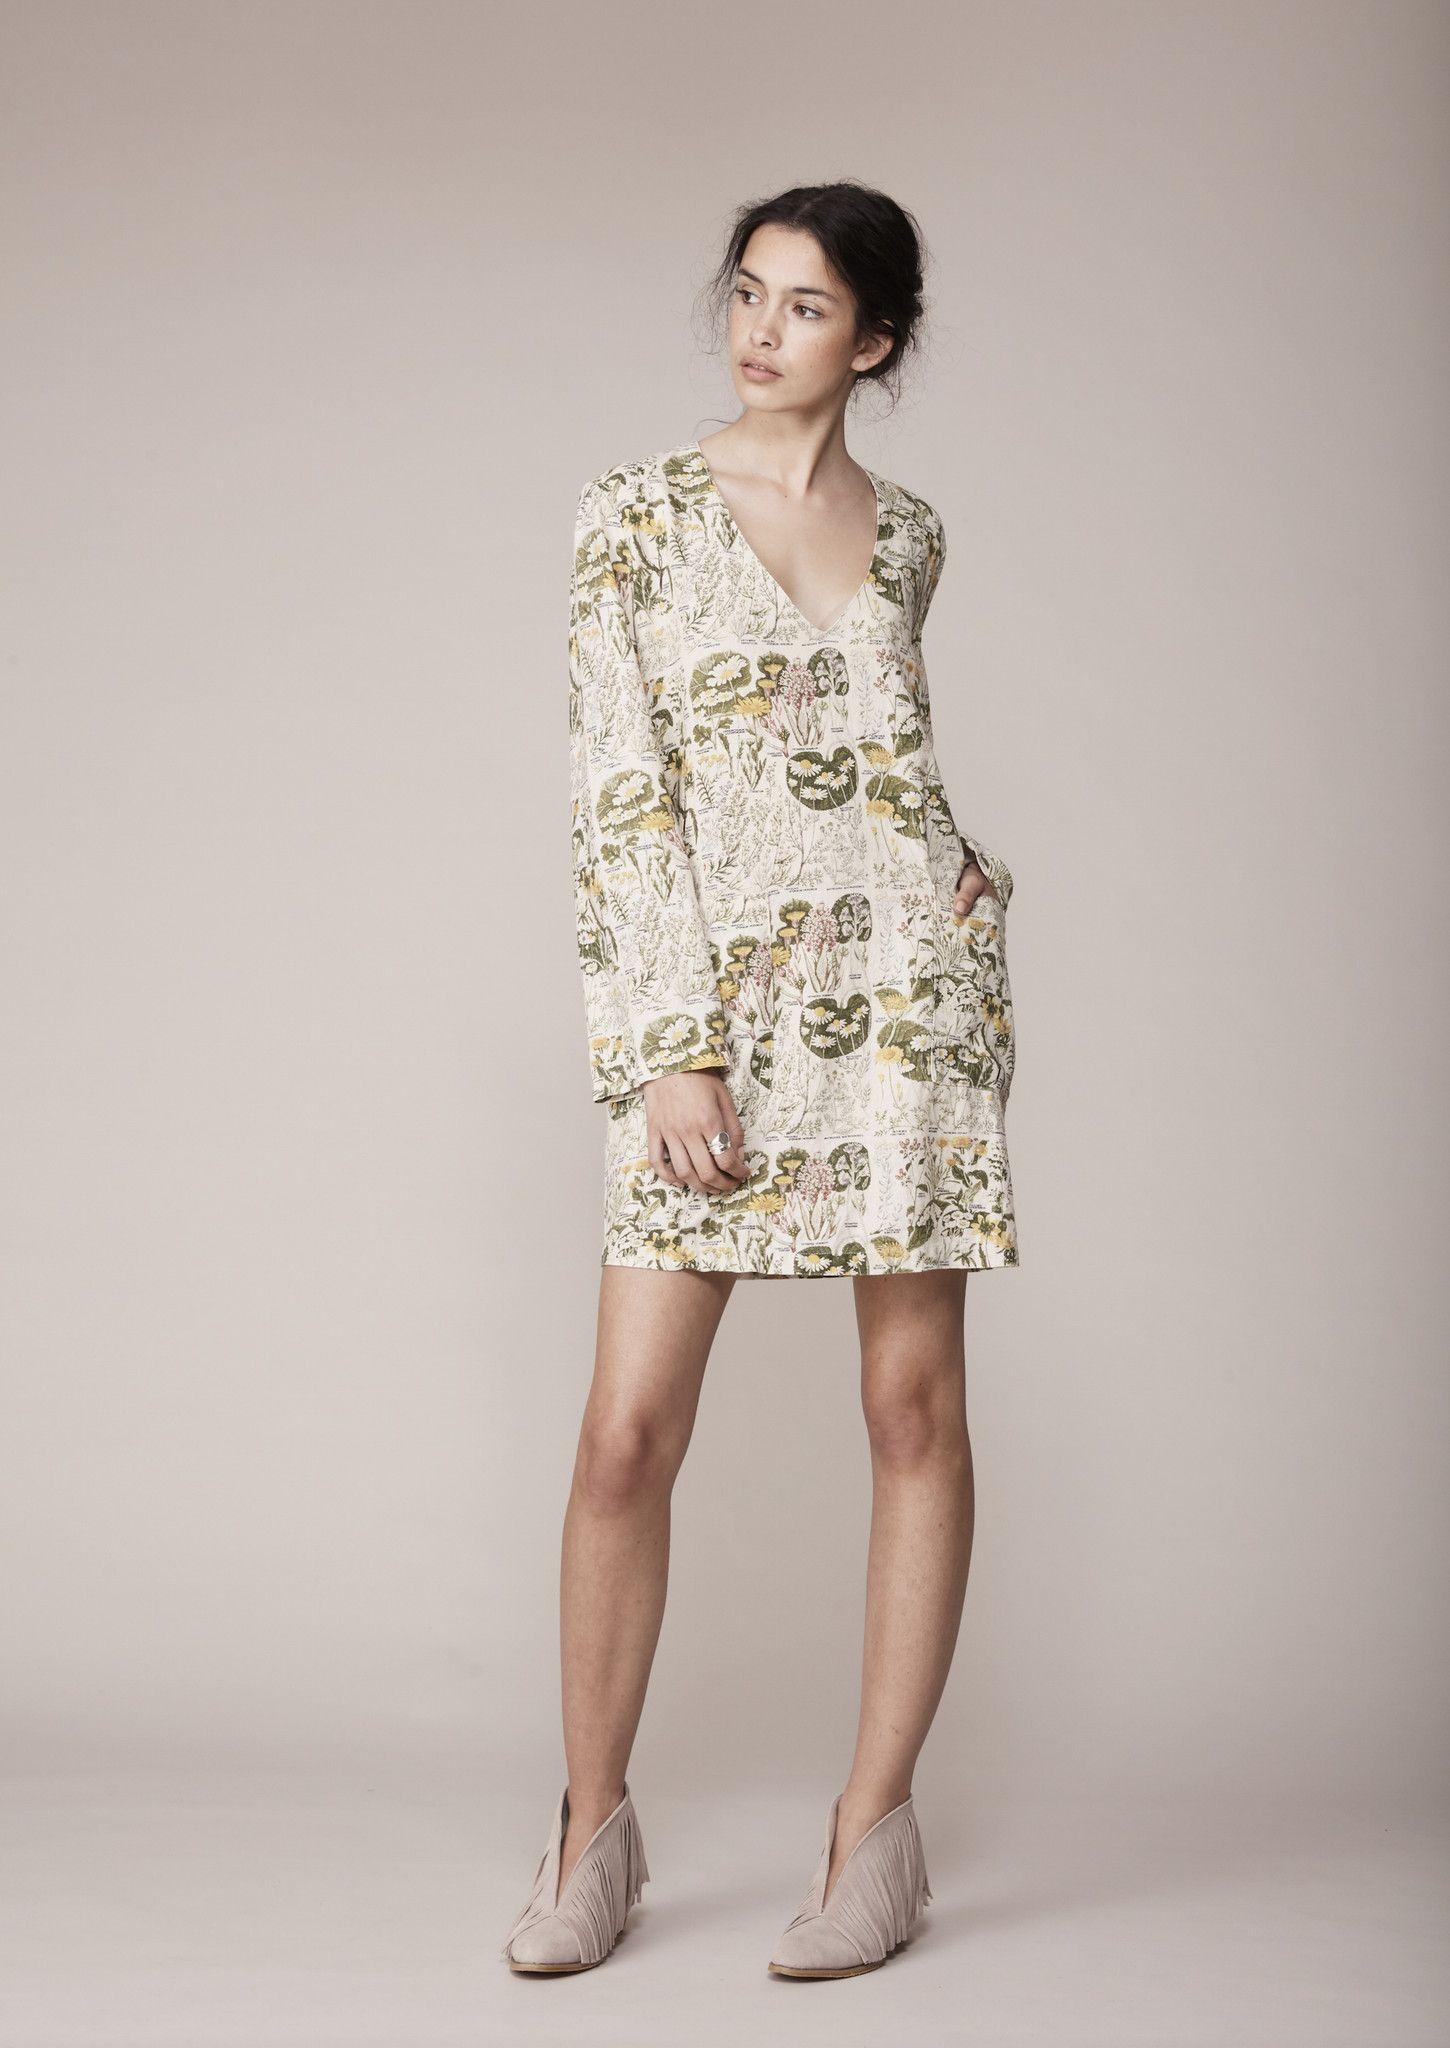 Binny - The Coorong Dress In Botanical Print